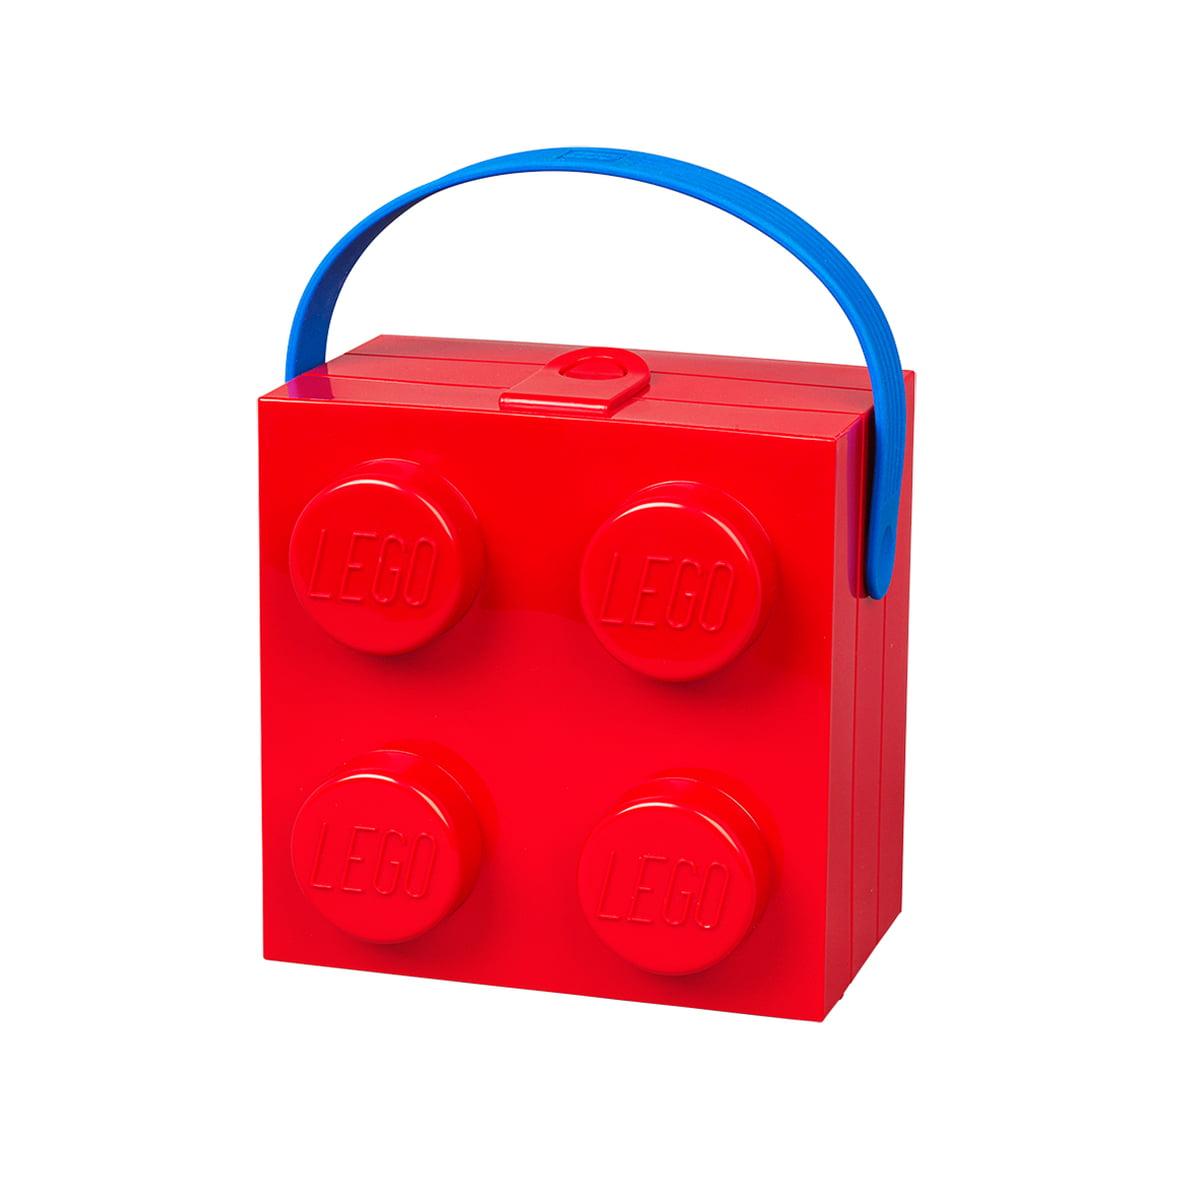 Lego - Lunch Box mit Griff, rot | Kinderzimmer > Spielzeuge | Rot | Polypropylen | Lego